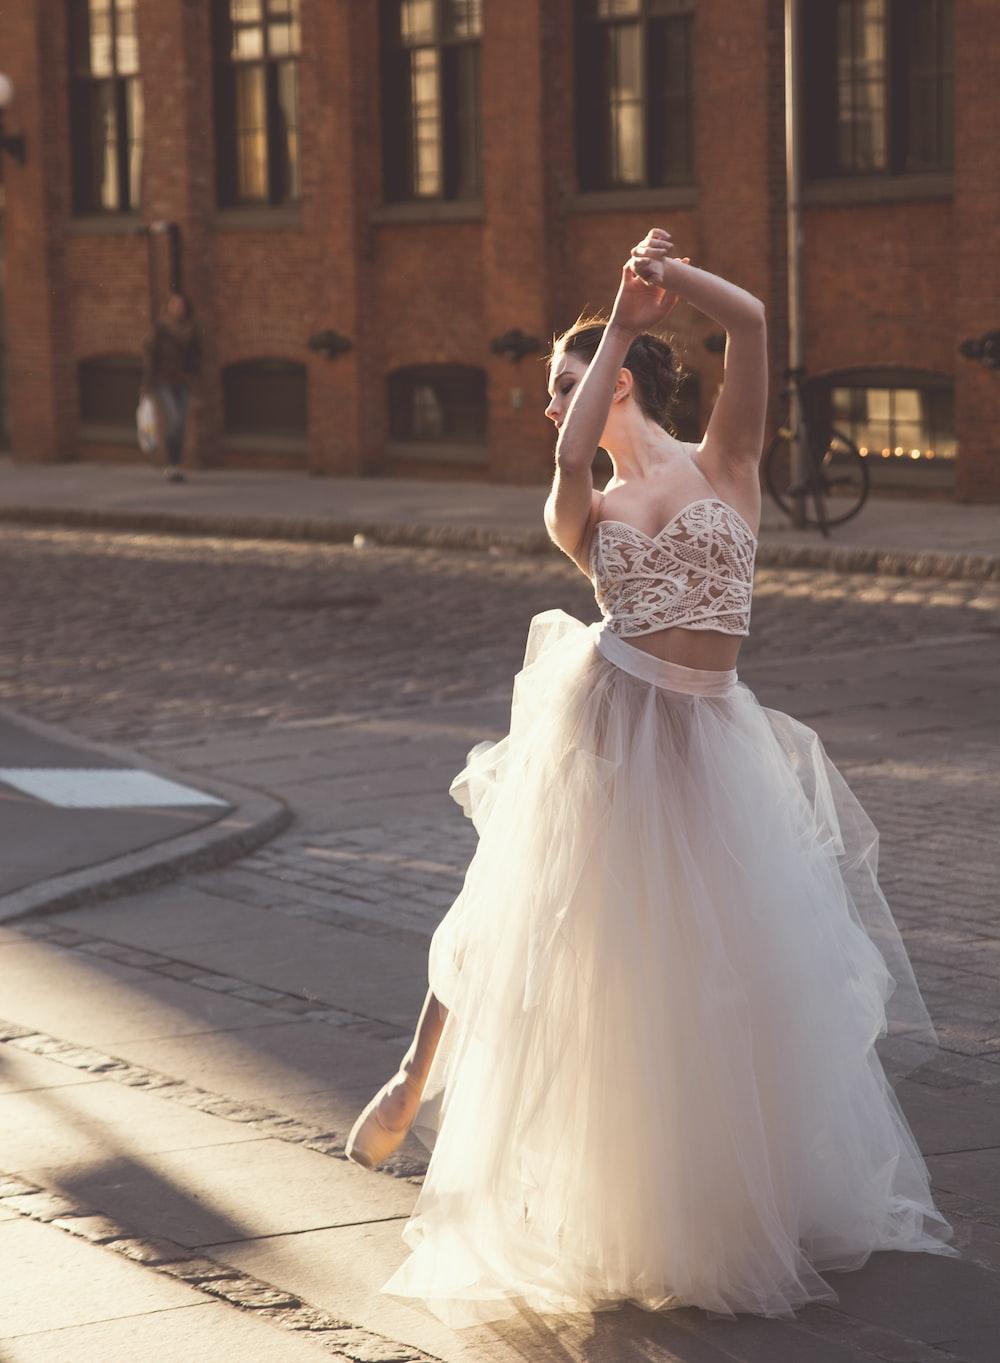 women's white floral sweetheart neckline dress dancing